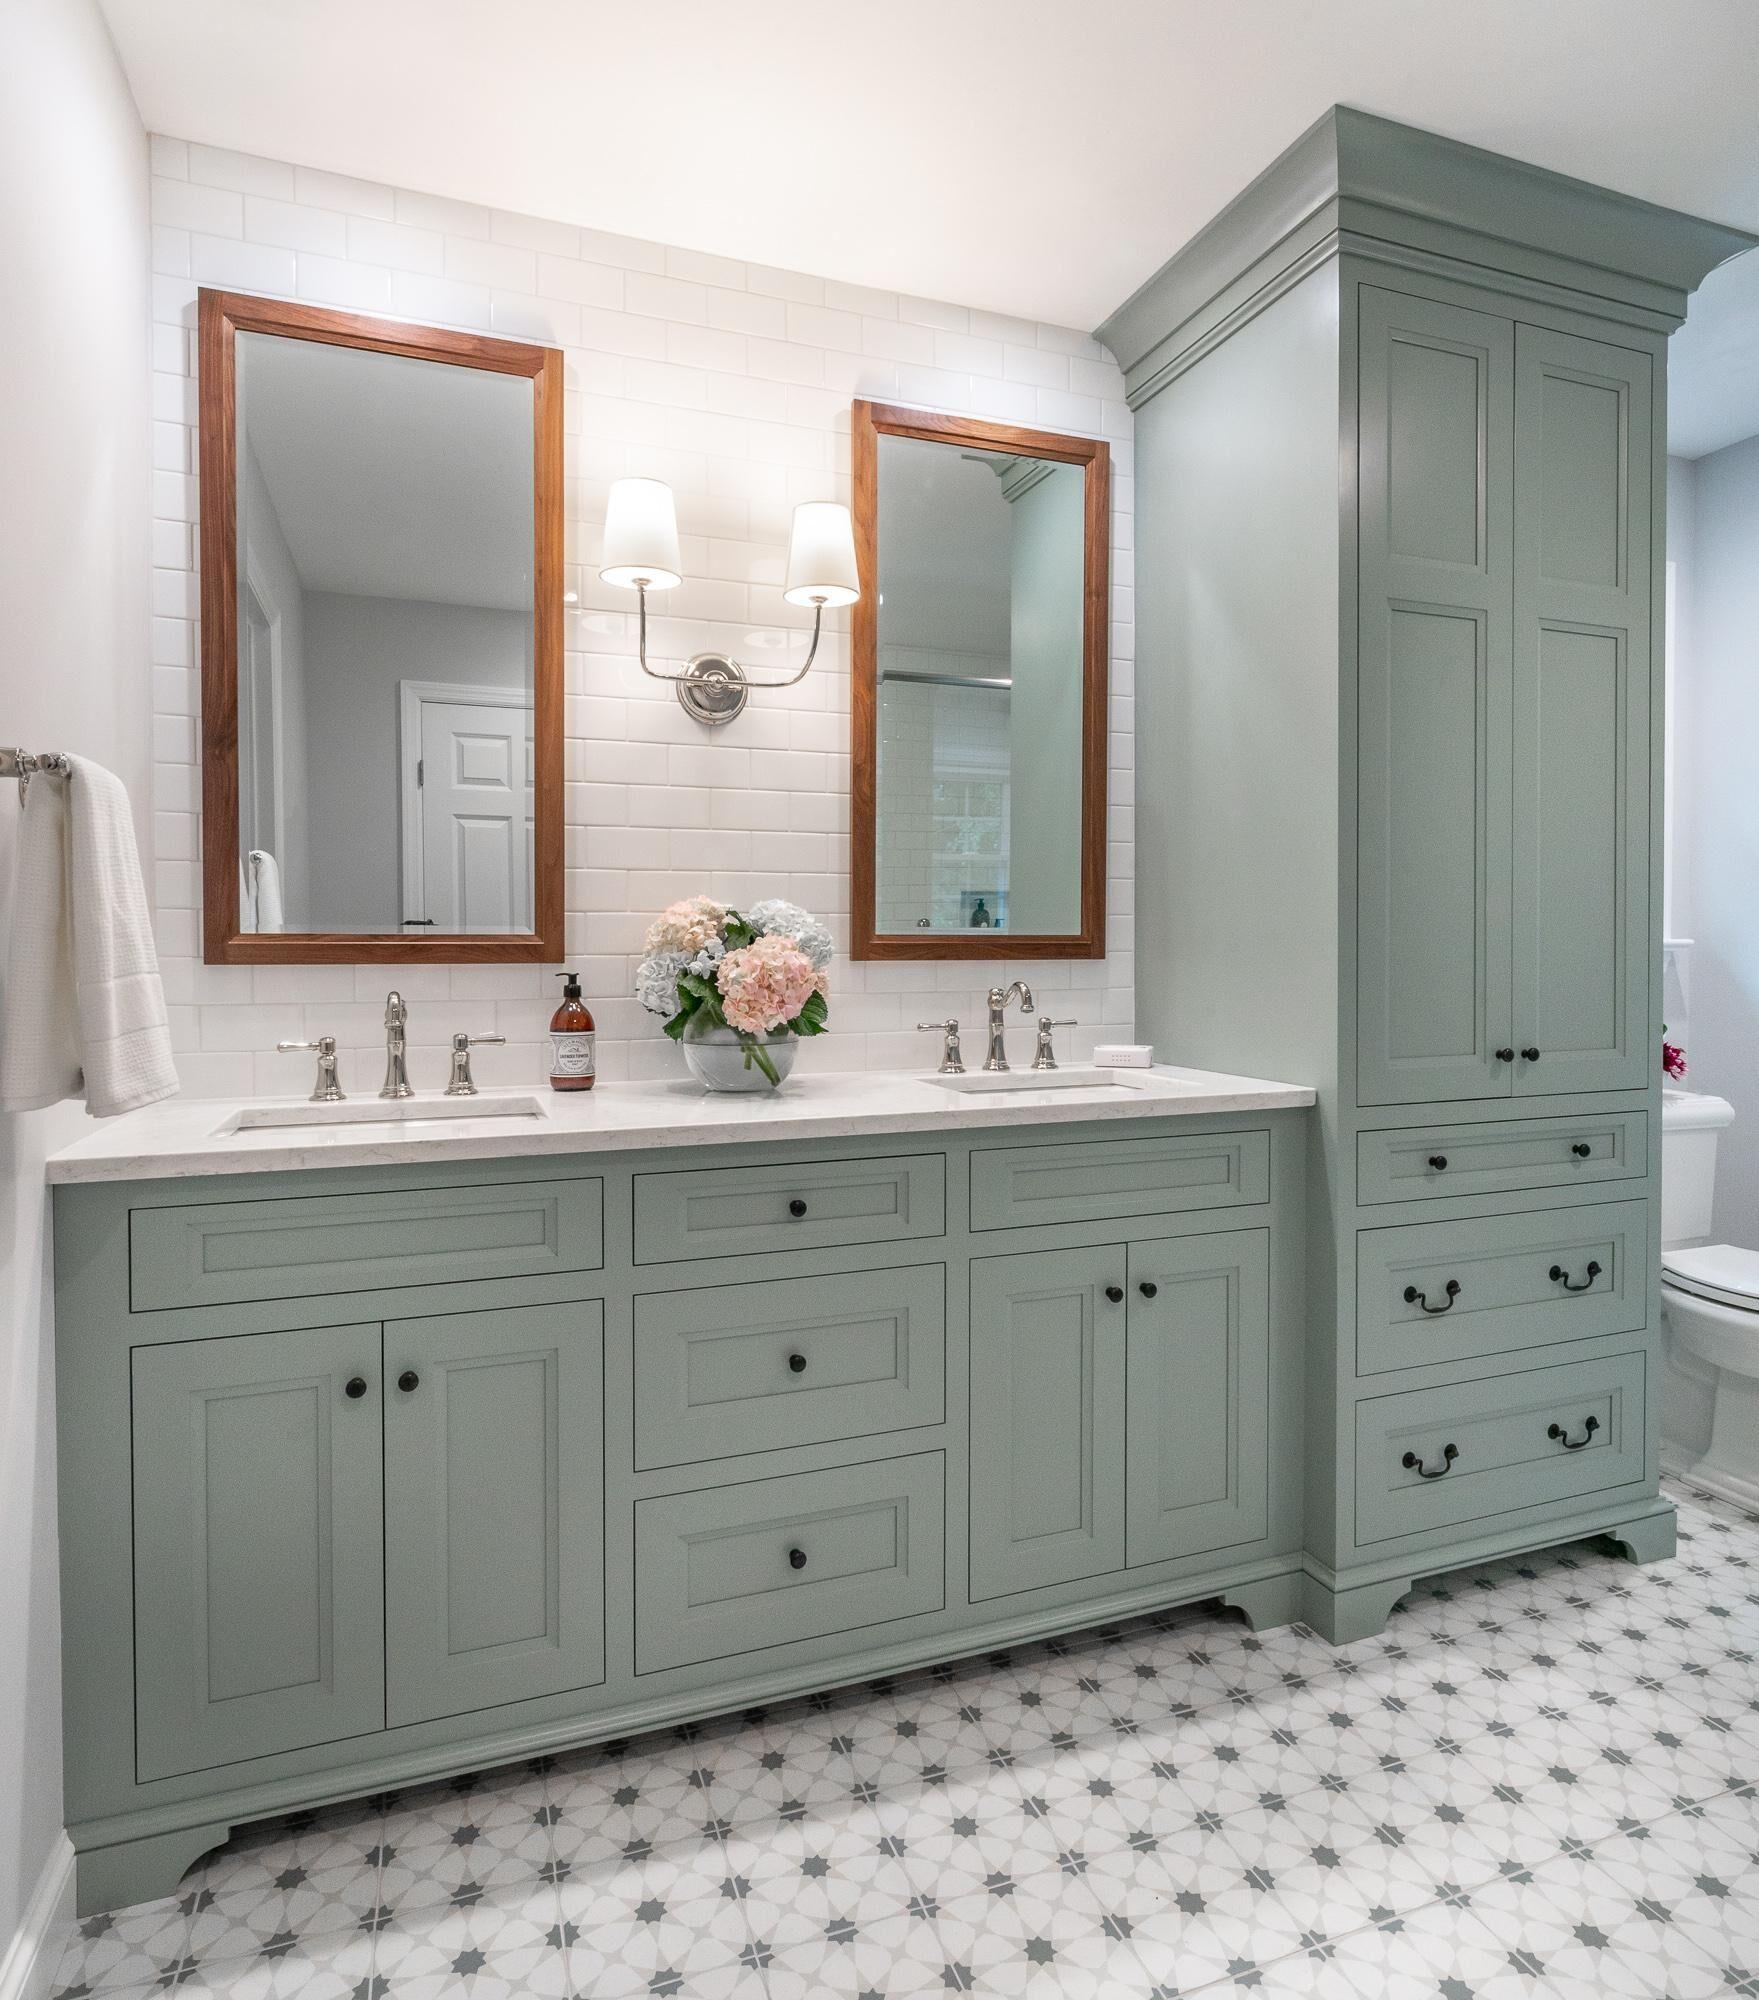 Jarrett Design Chose A Custom Blue Green Paint For The Rutt Cabinets In This Master Bath Which W Custom Bathroom Bathroom Cabinet Colors Master Bathroom Design [ 2000 x 1759 Pixel ]